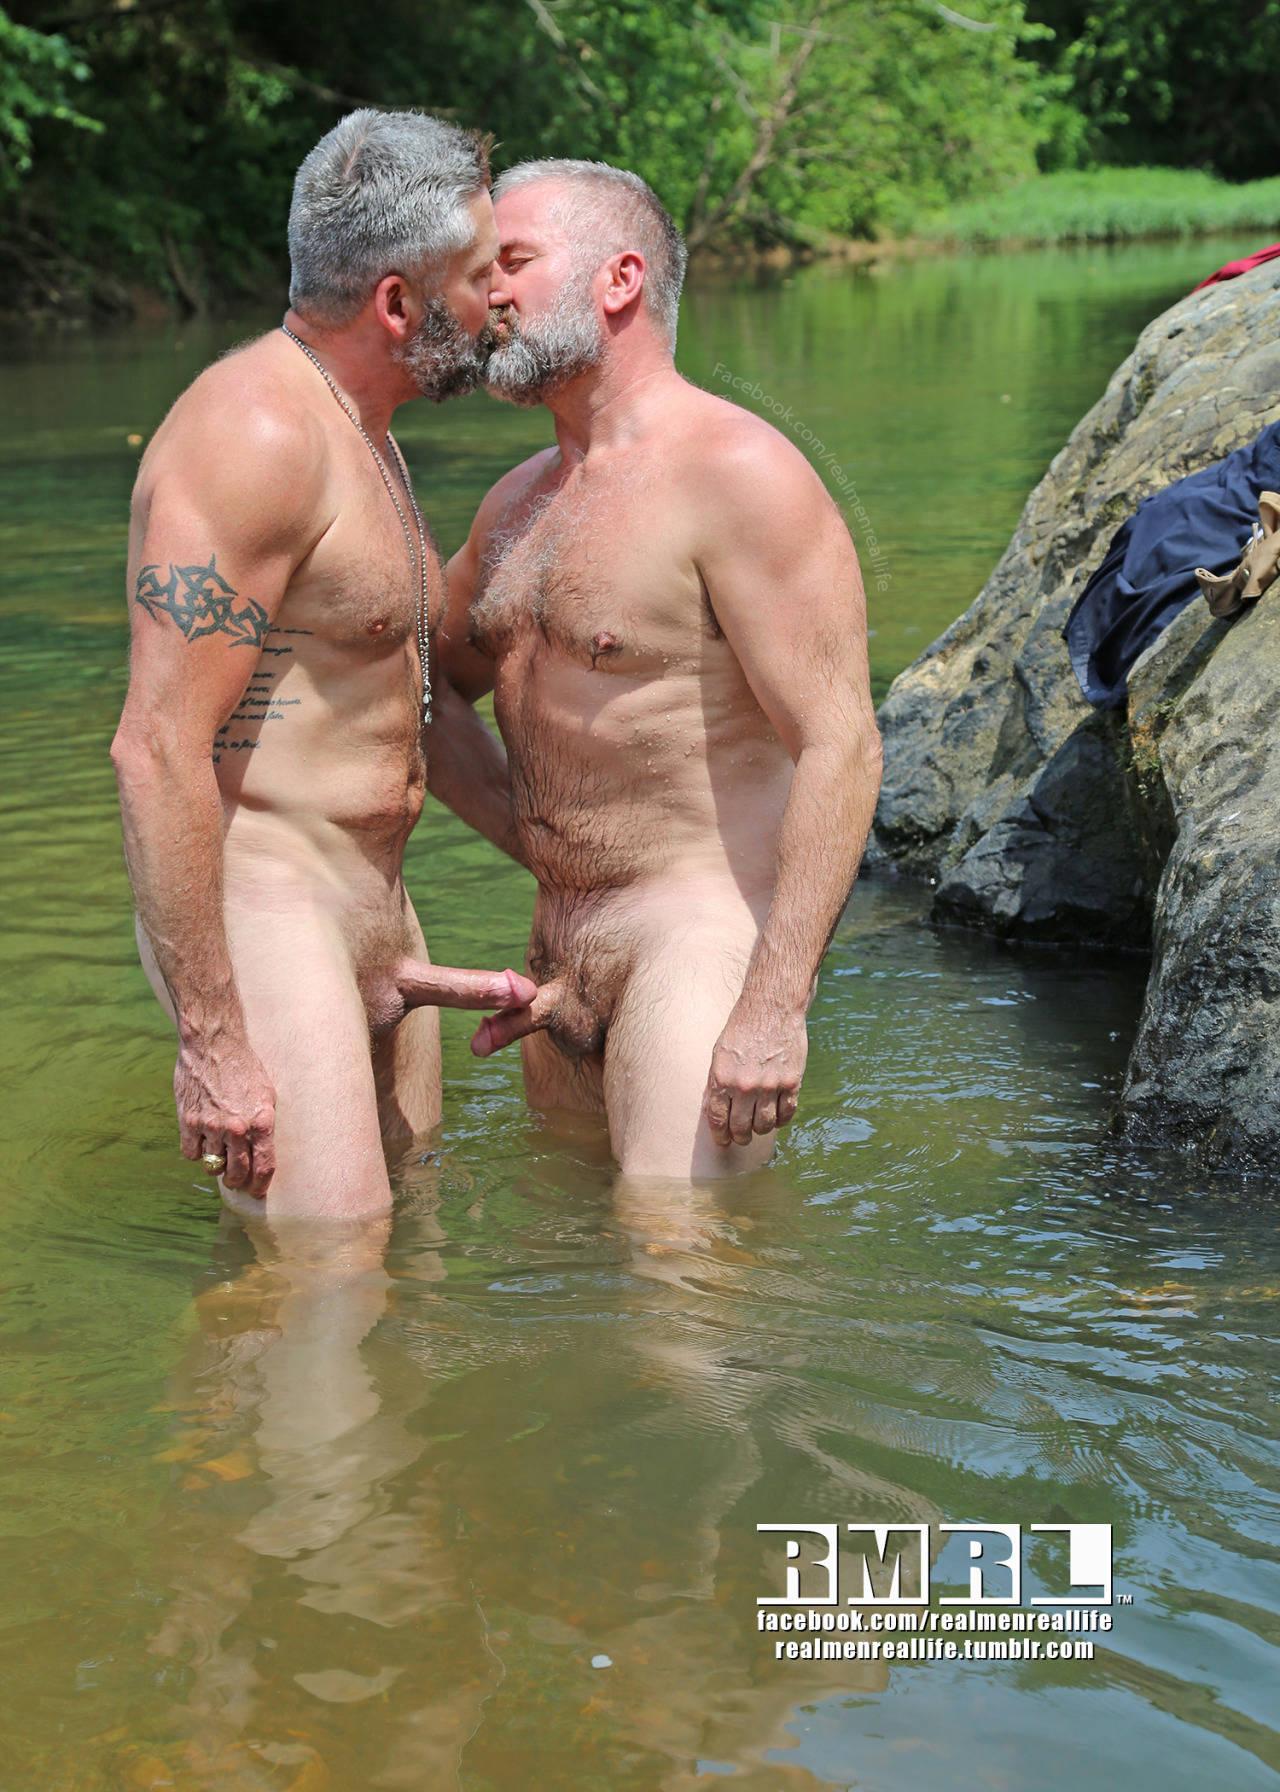 New gay porn 2019 Cute guys sex gay